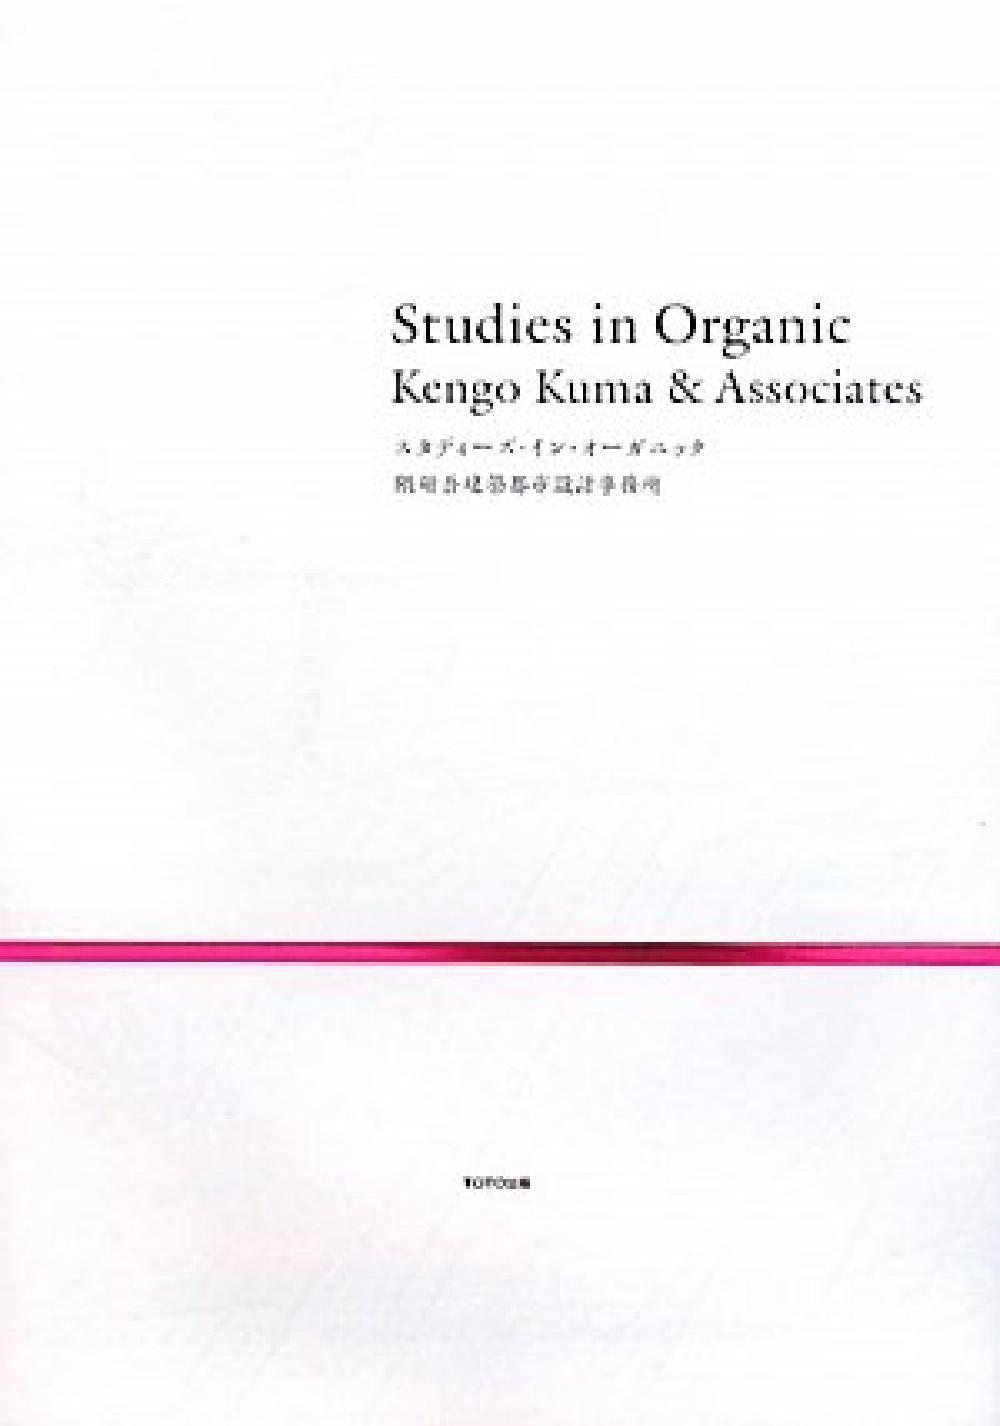 STUDIES IN ORGANIC KENGO KUMA & ASSOCIATES